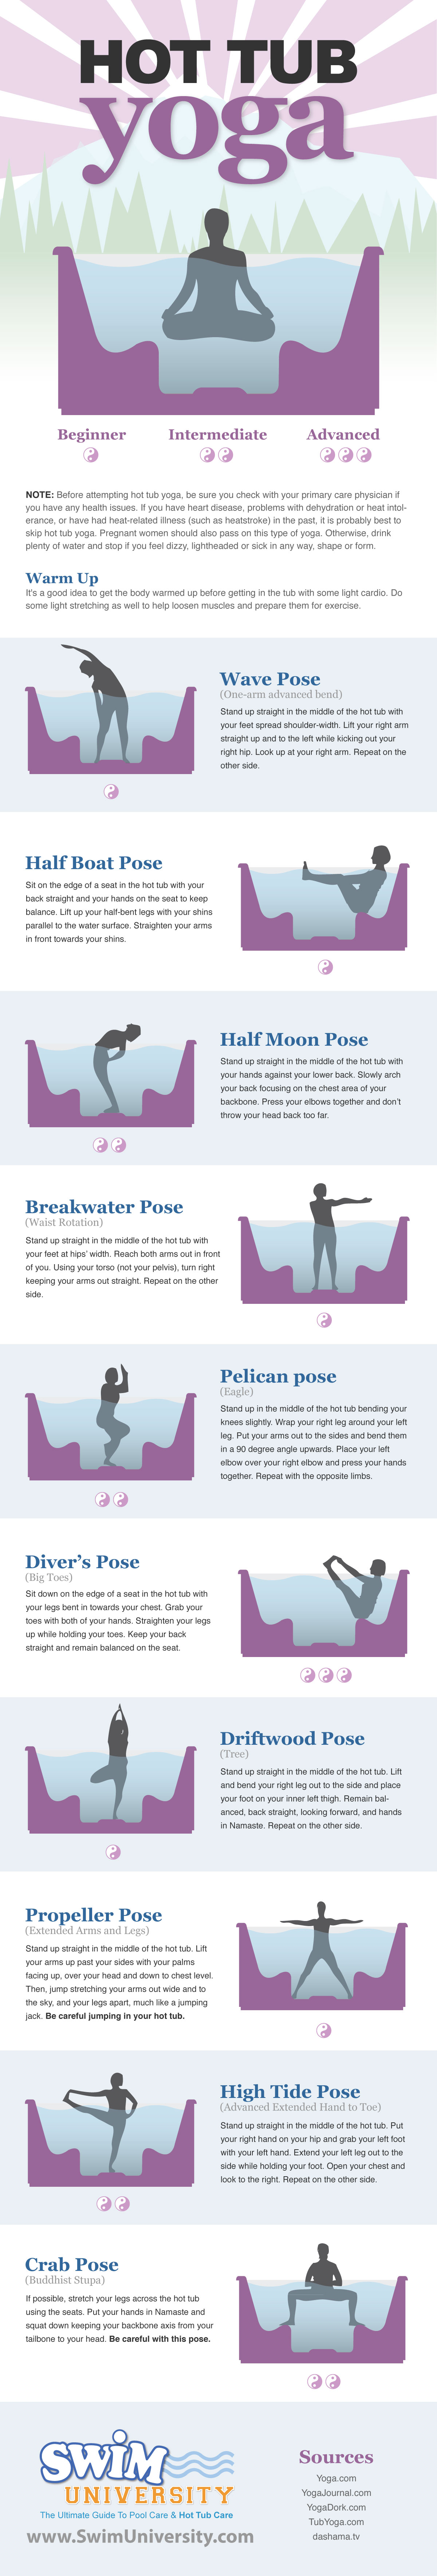 hot-tub-yoga